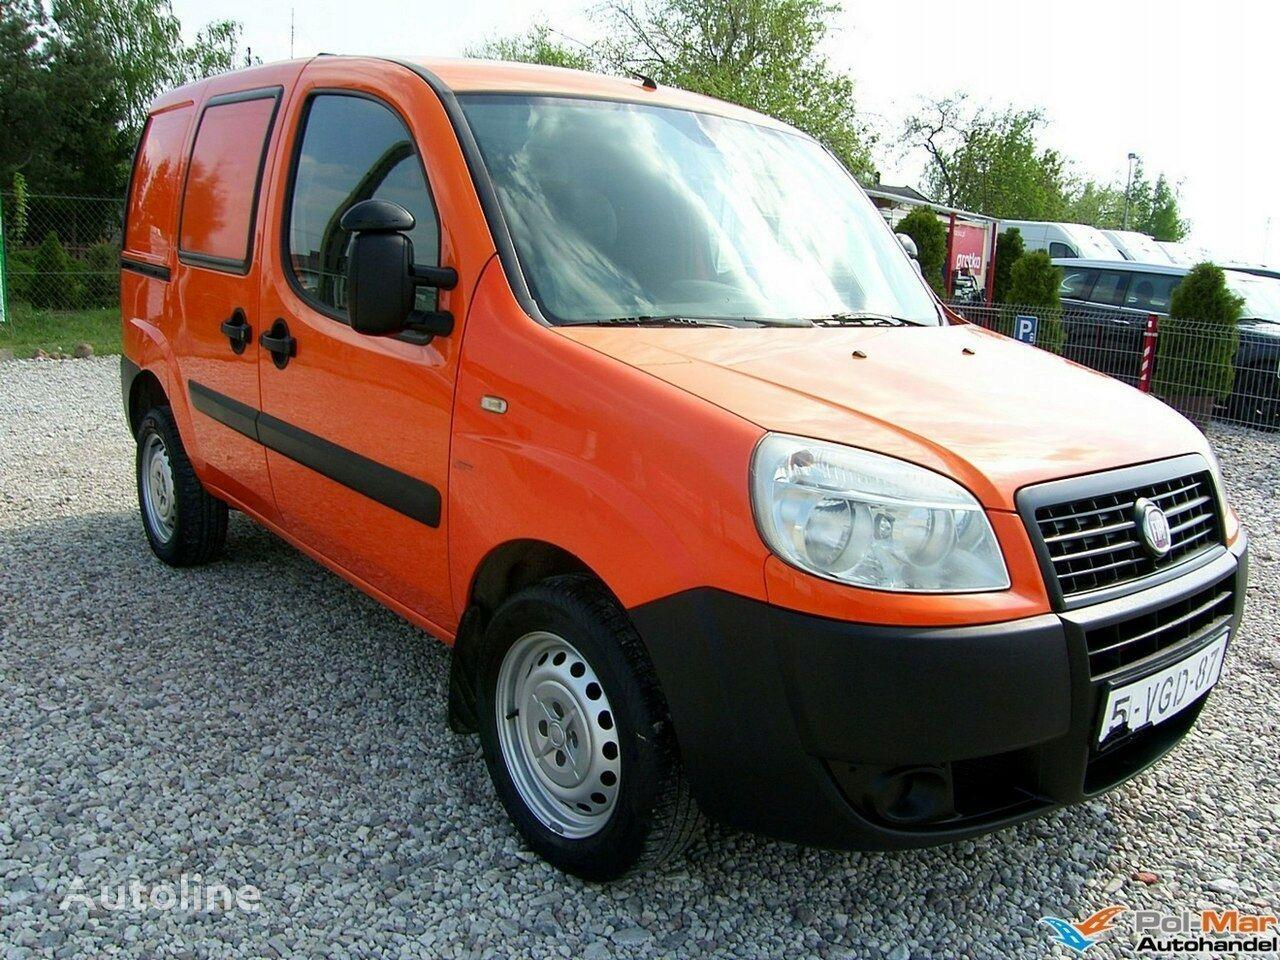 FIAT Doblo multijet car-derived van